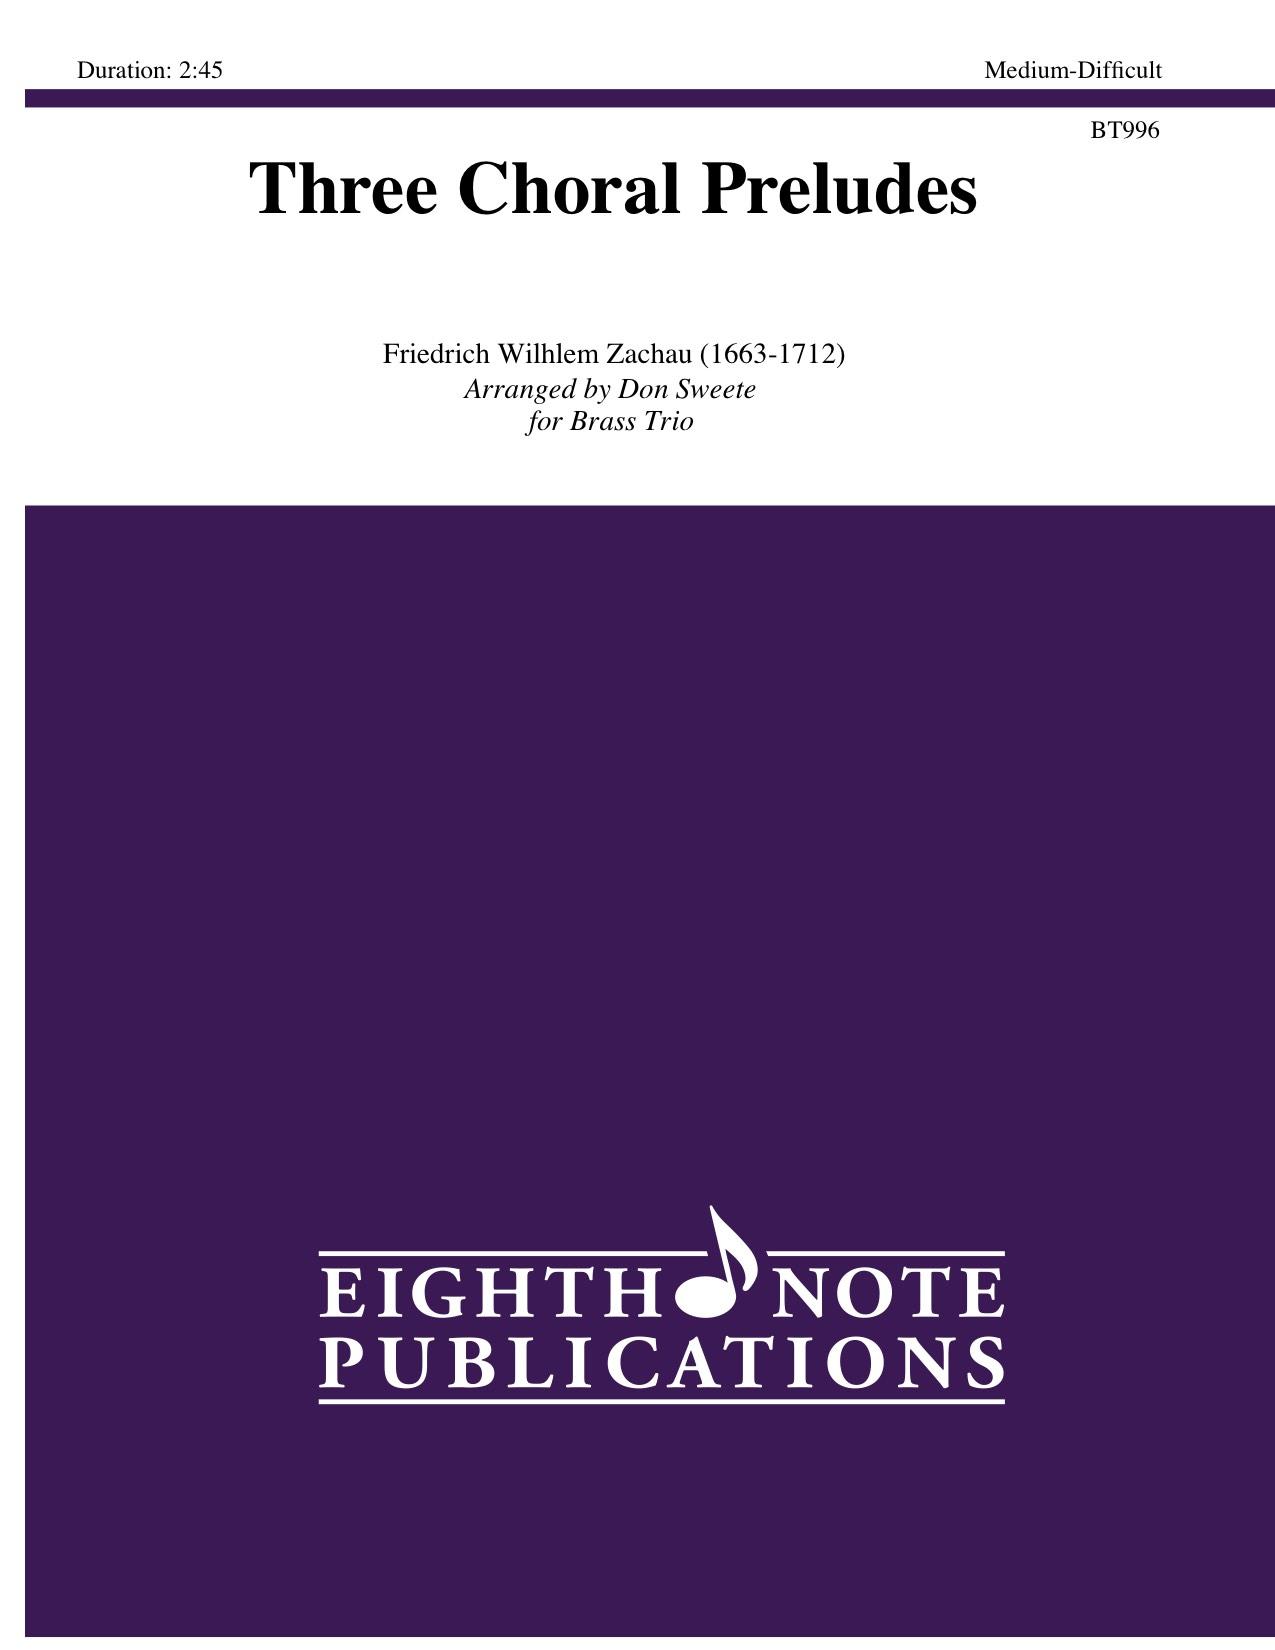 Three Choral Preludes - Friedrich Wilhlem Zachau